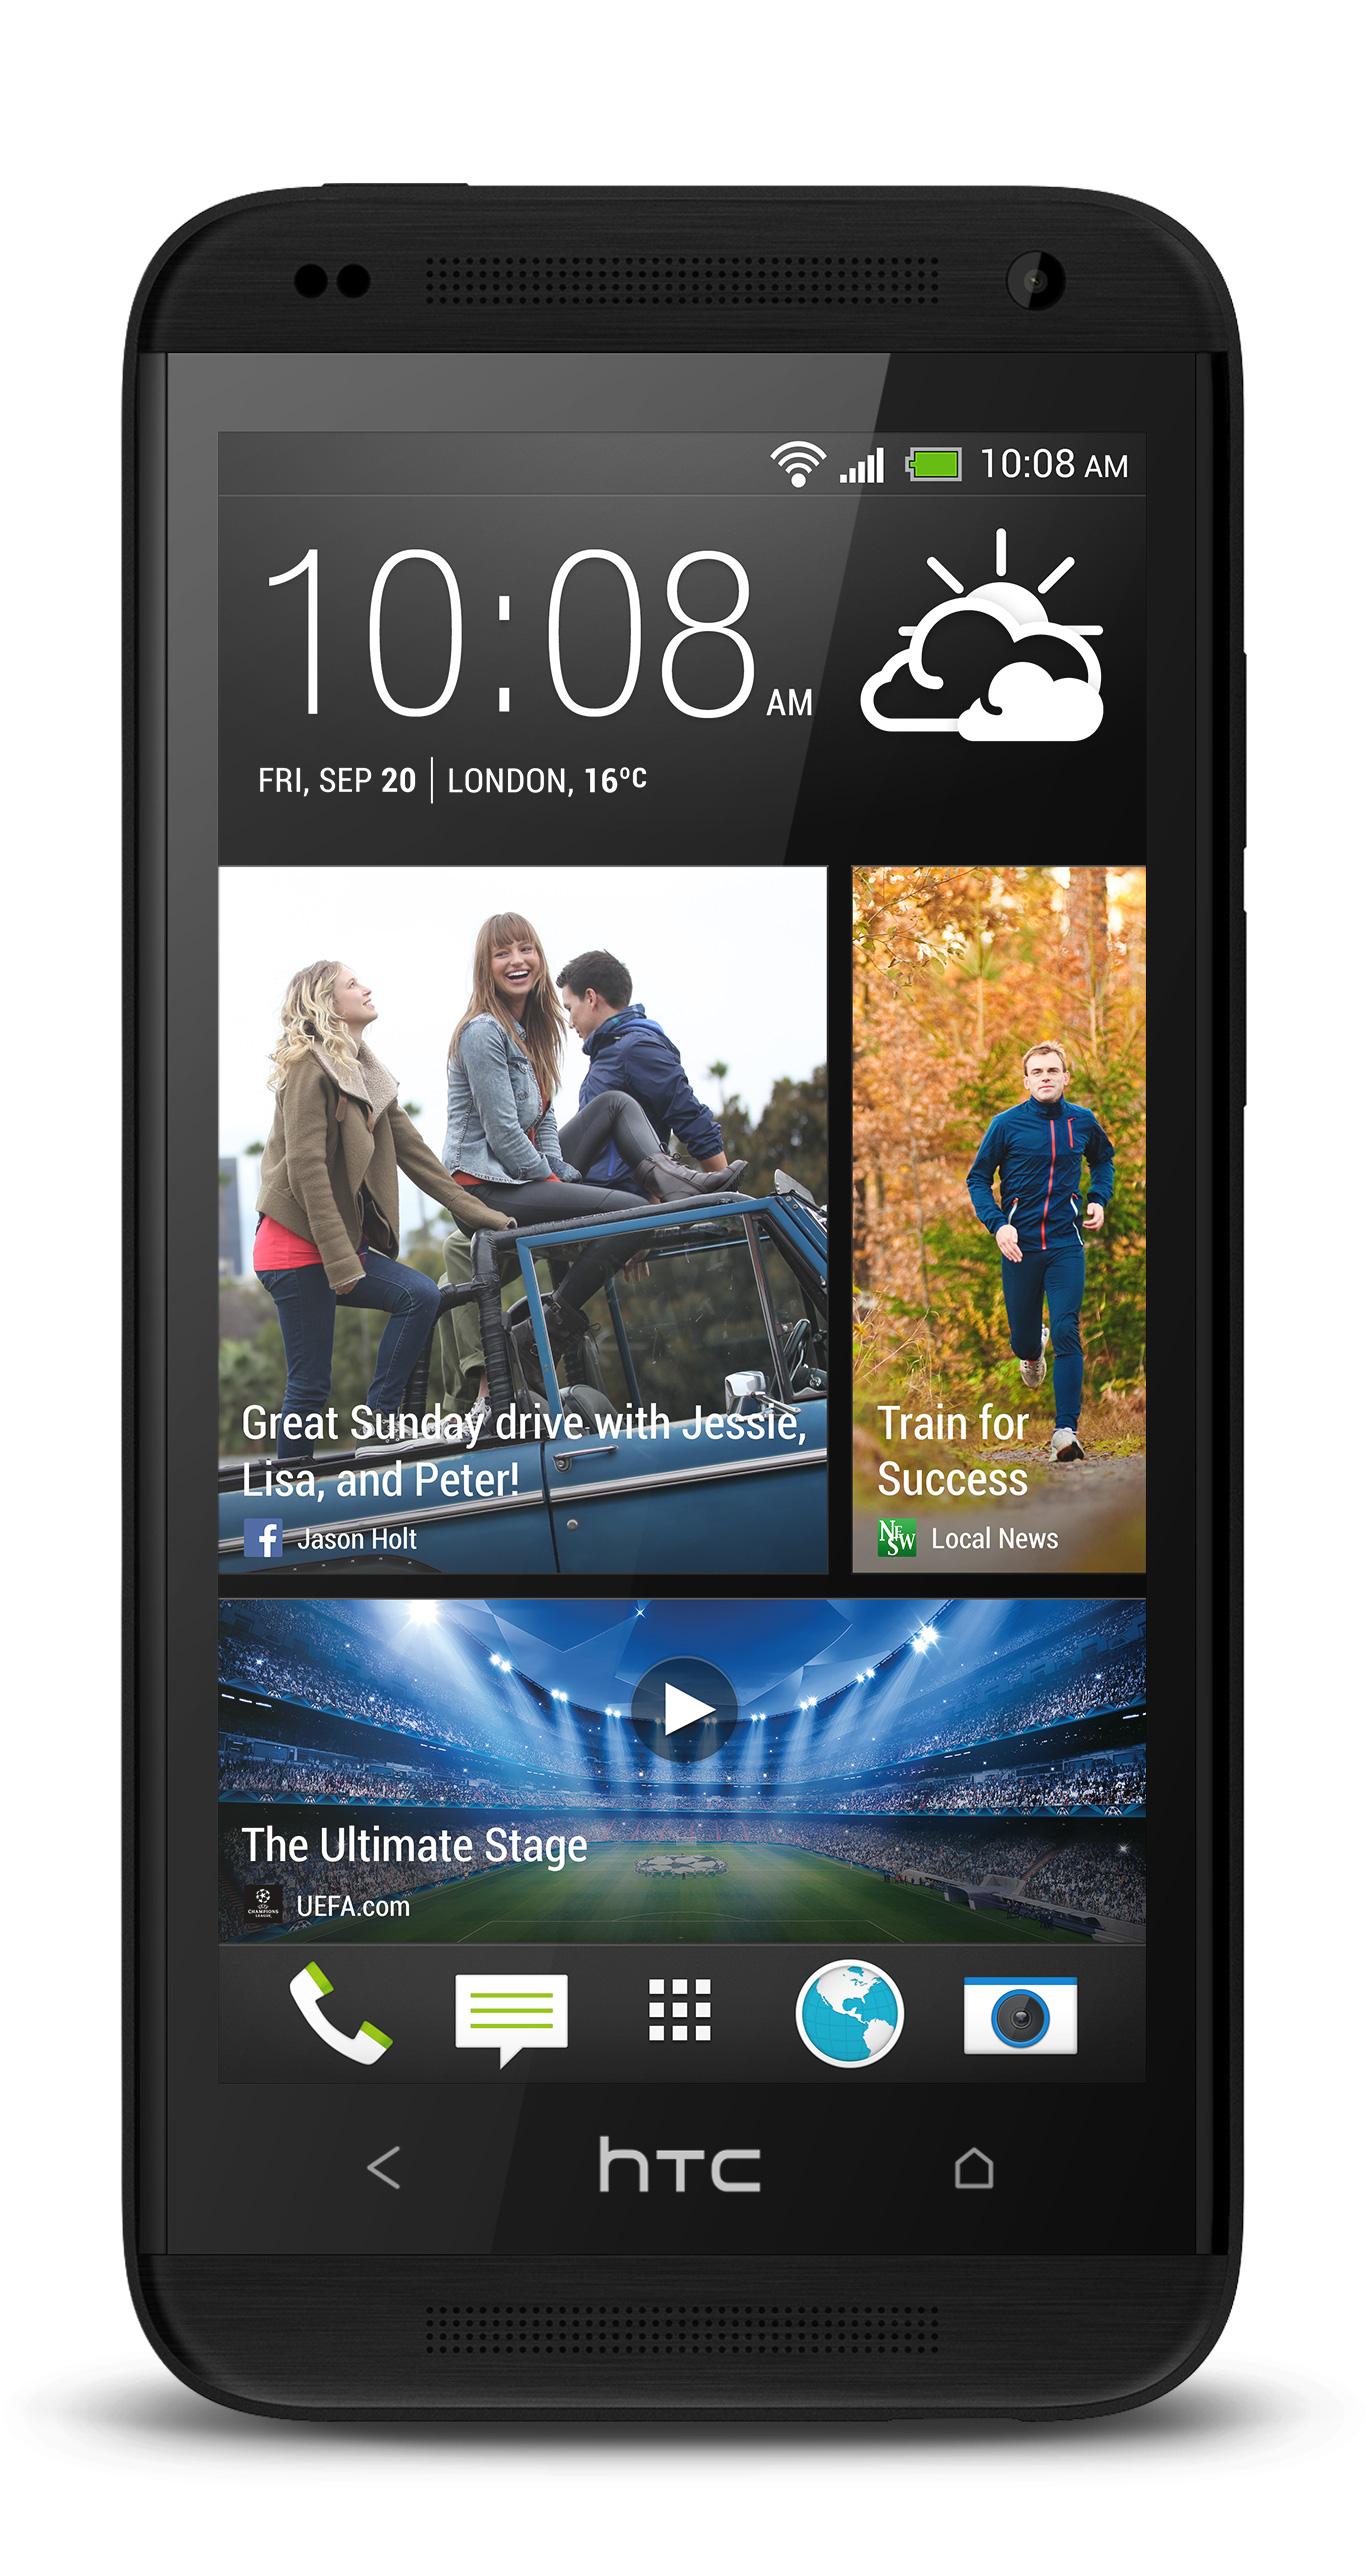 HTC Desire Image